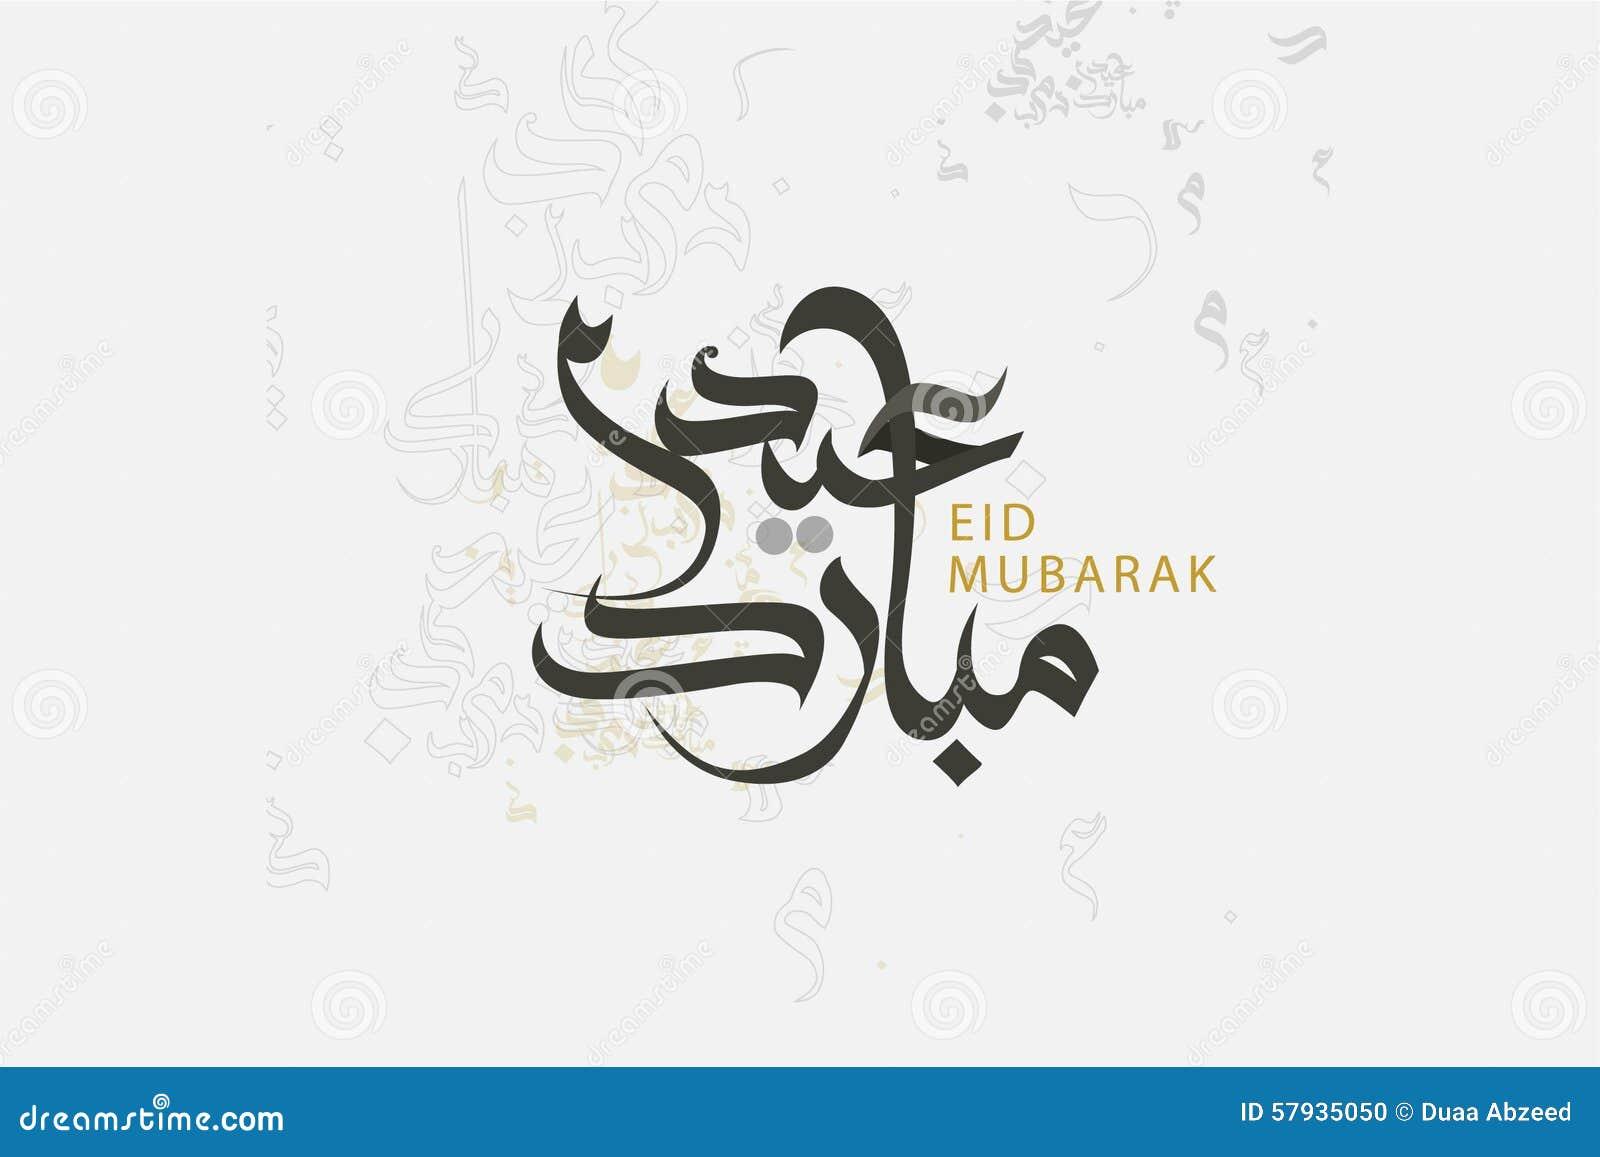 Eid Mubarak in Arabic for greeting wishing